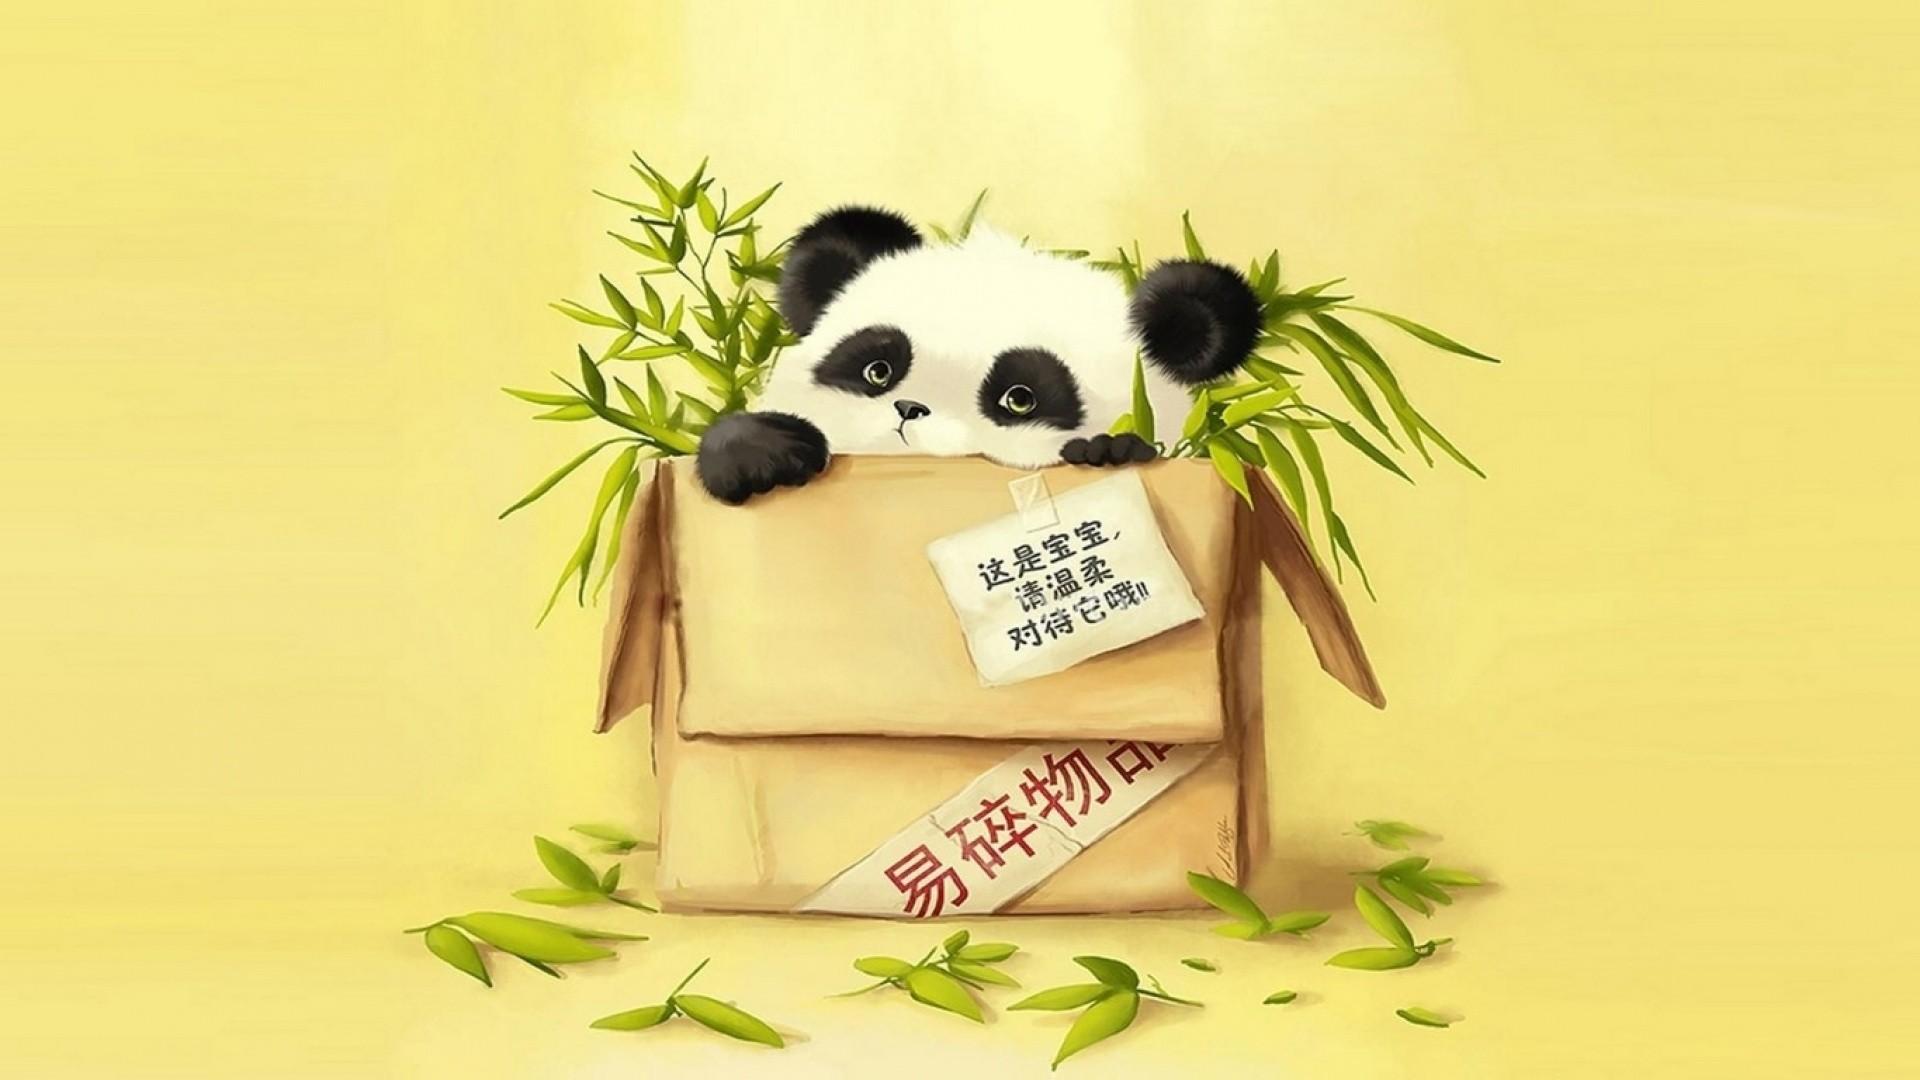 Cute Panda Wallpapers 64 Pictures